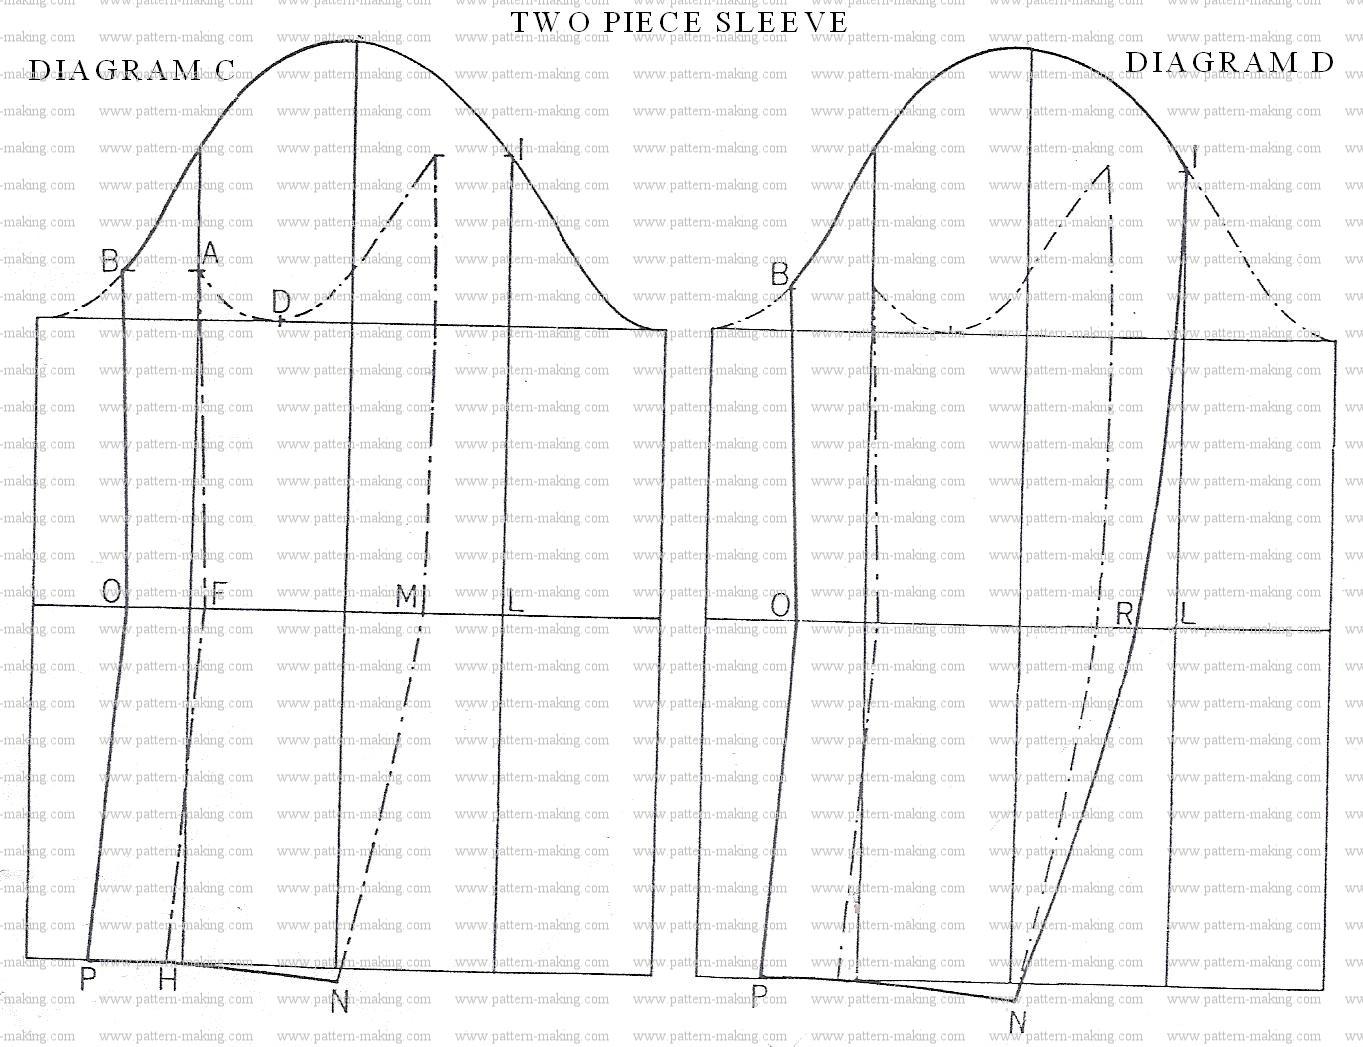 Mens jacket pattern making - How To Draft Men Jacket Two Piece Sleeve 1 Pattern Making Com